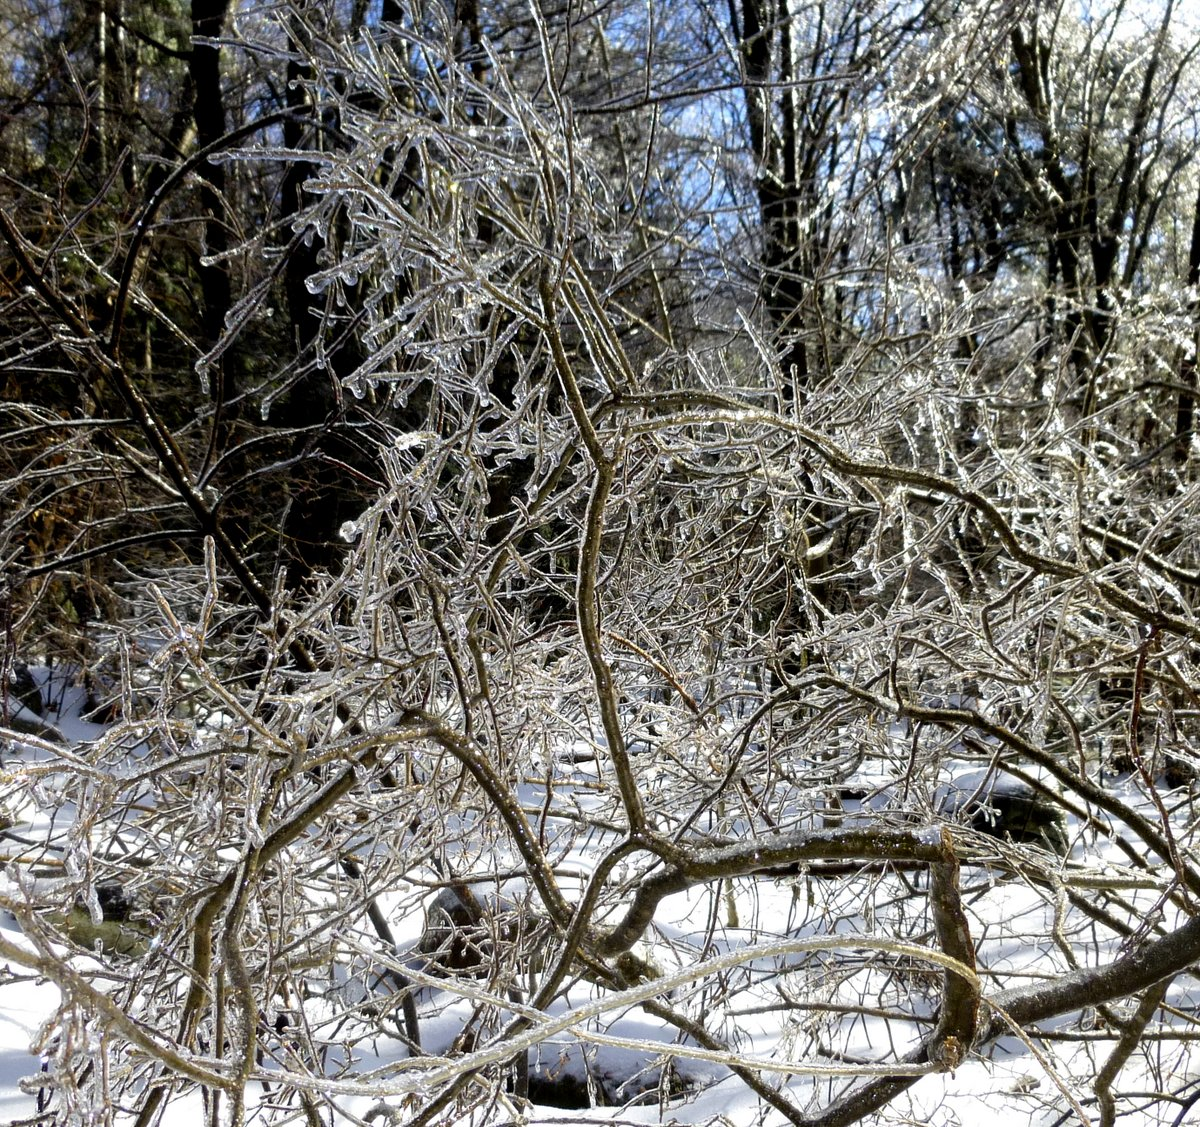 3. Icy Bush